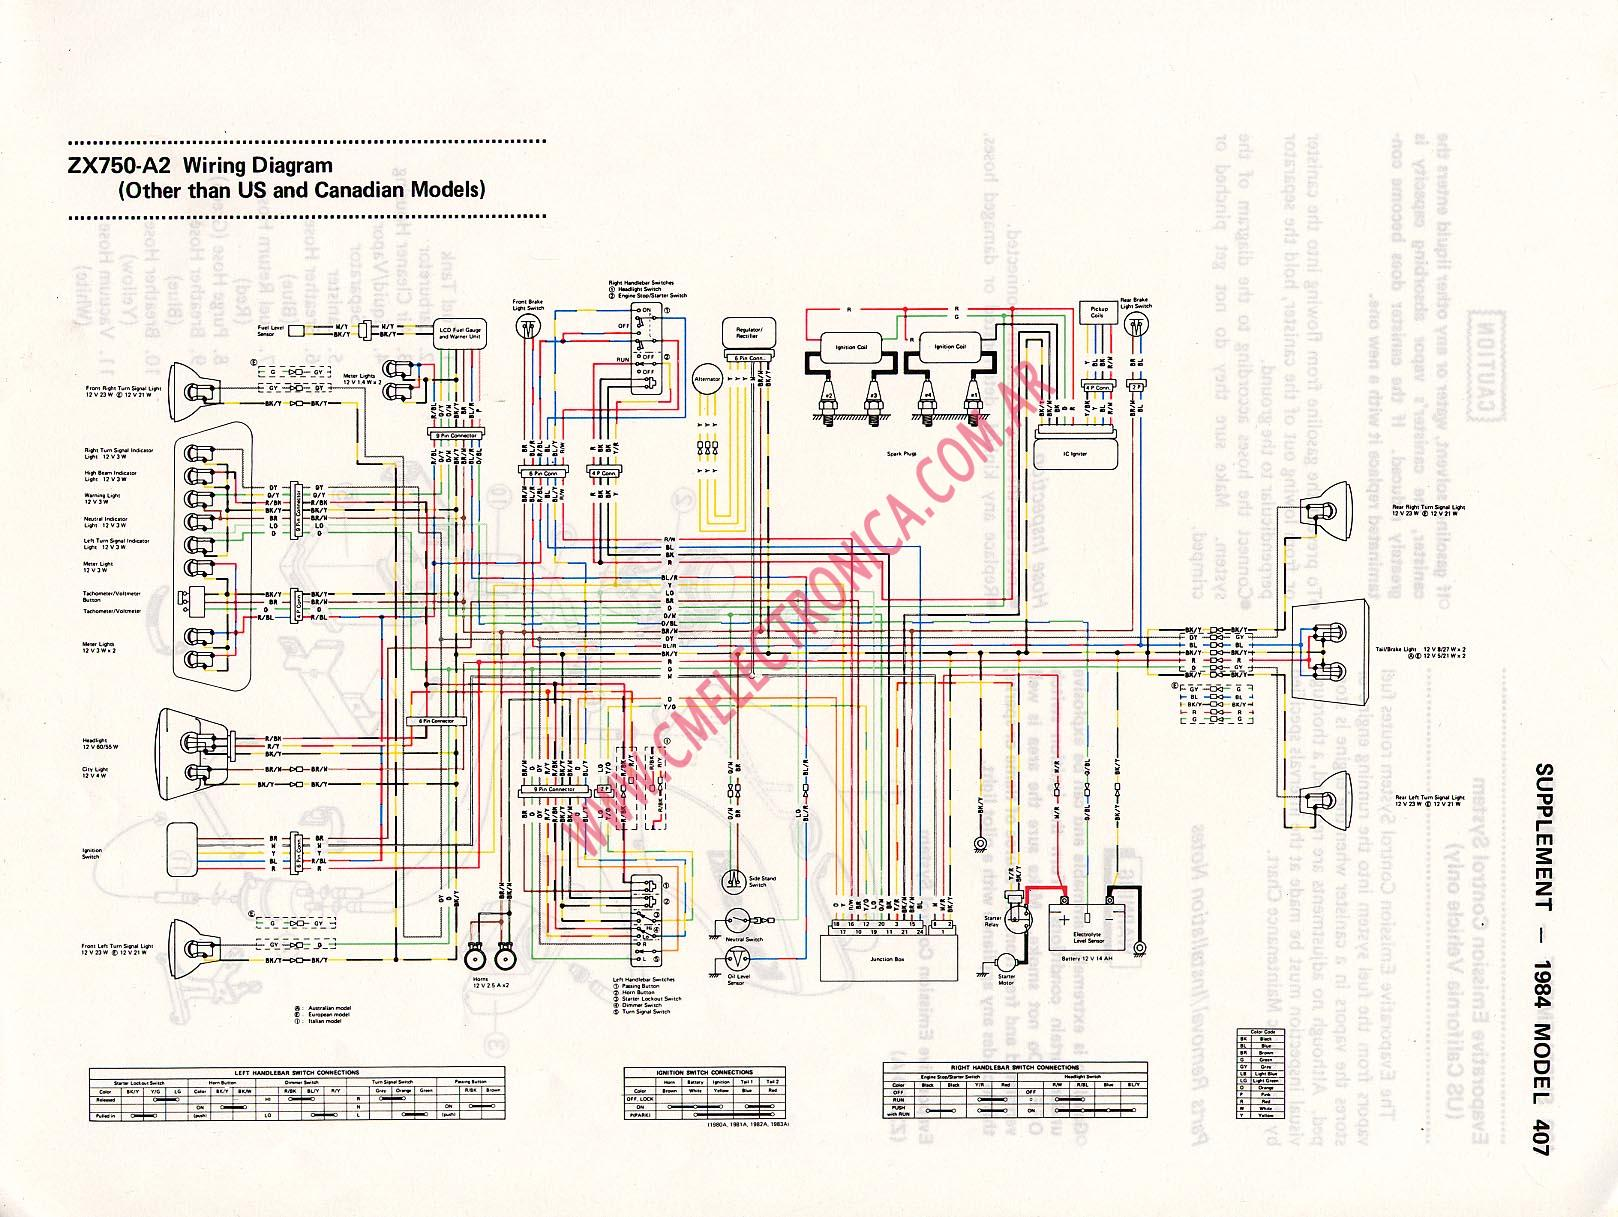 wrg 9303] kawasaki zzr 600 wiring diagram Kawasaki ZZR 600